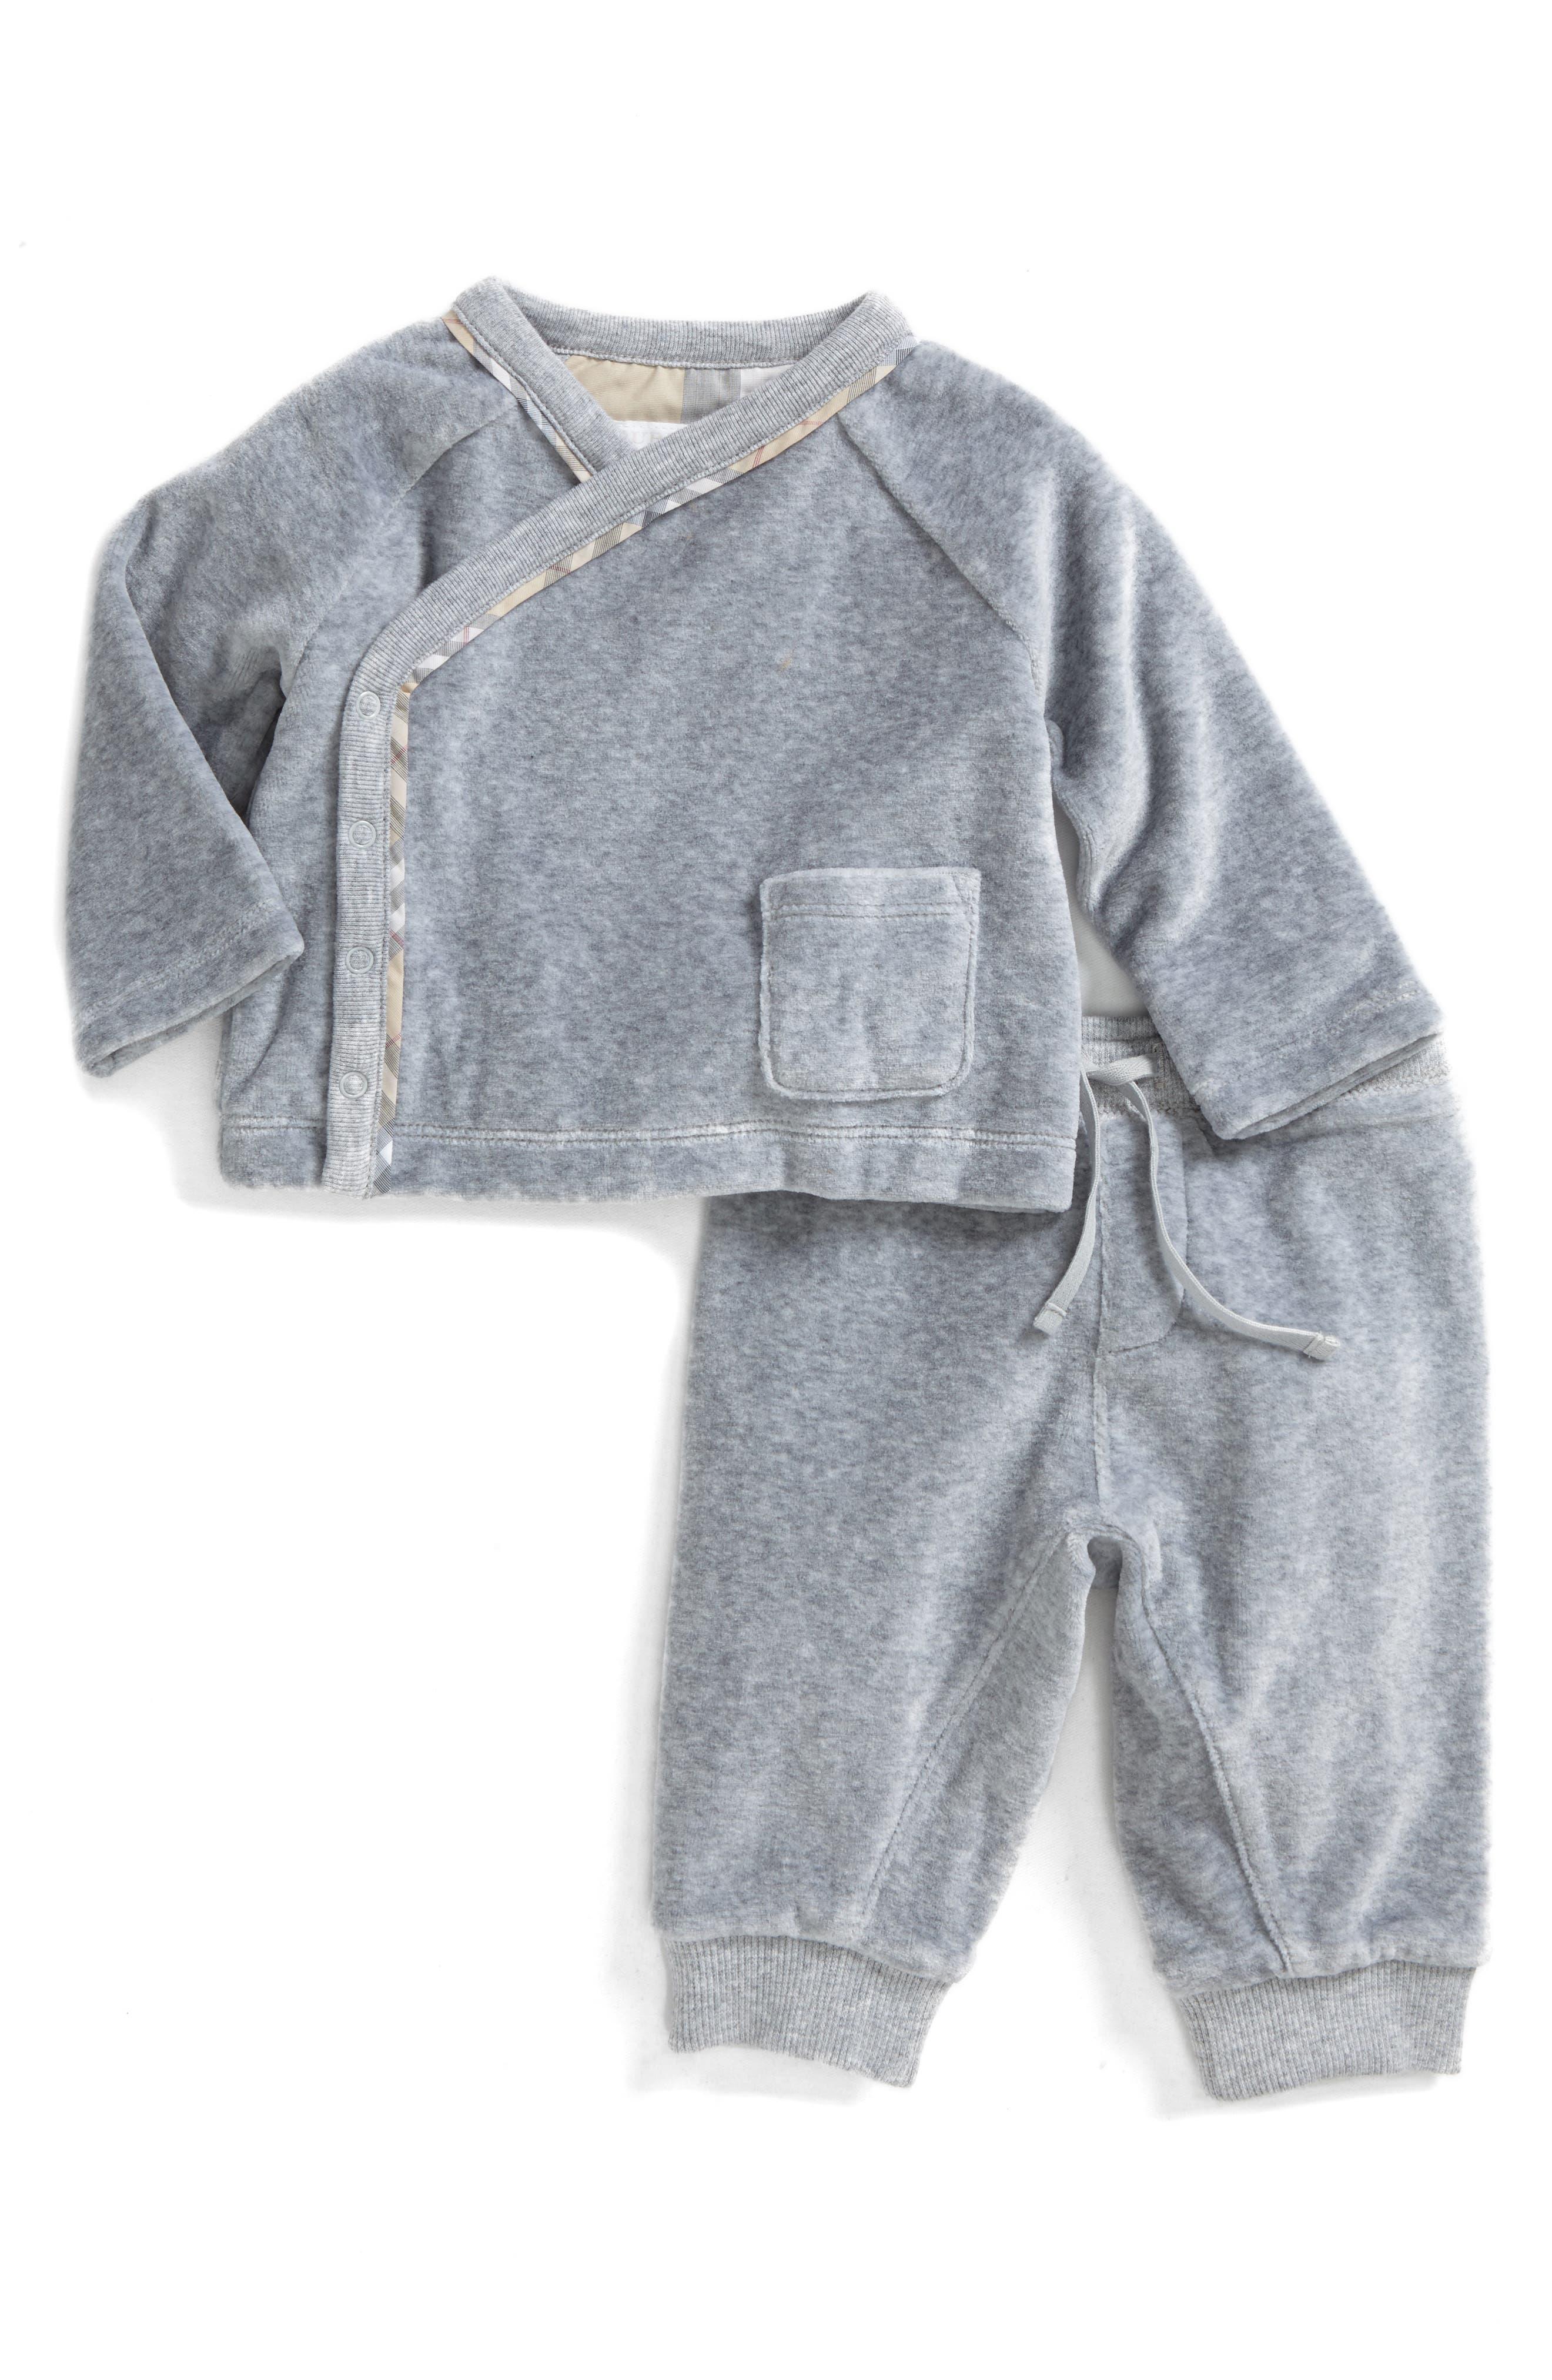 Main Image - Burberry Remy Shirt & Pants Set (Baby Boys)